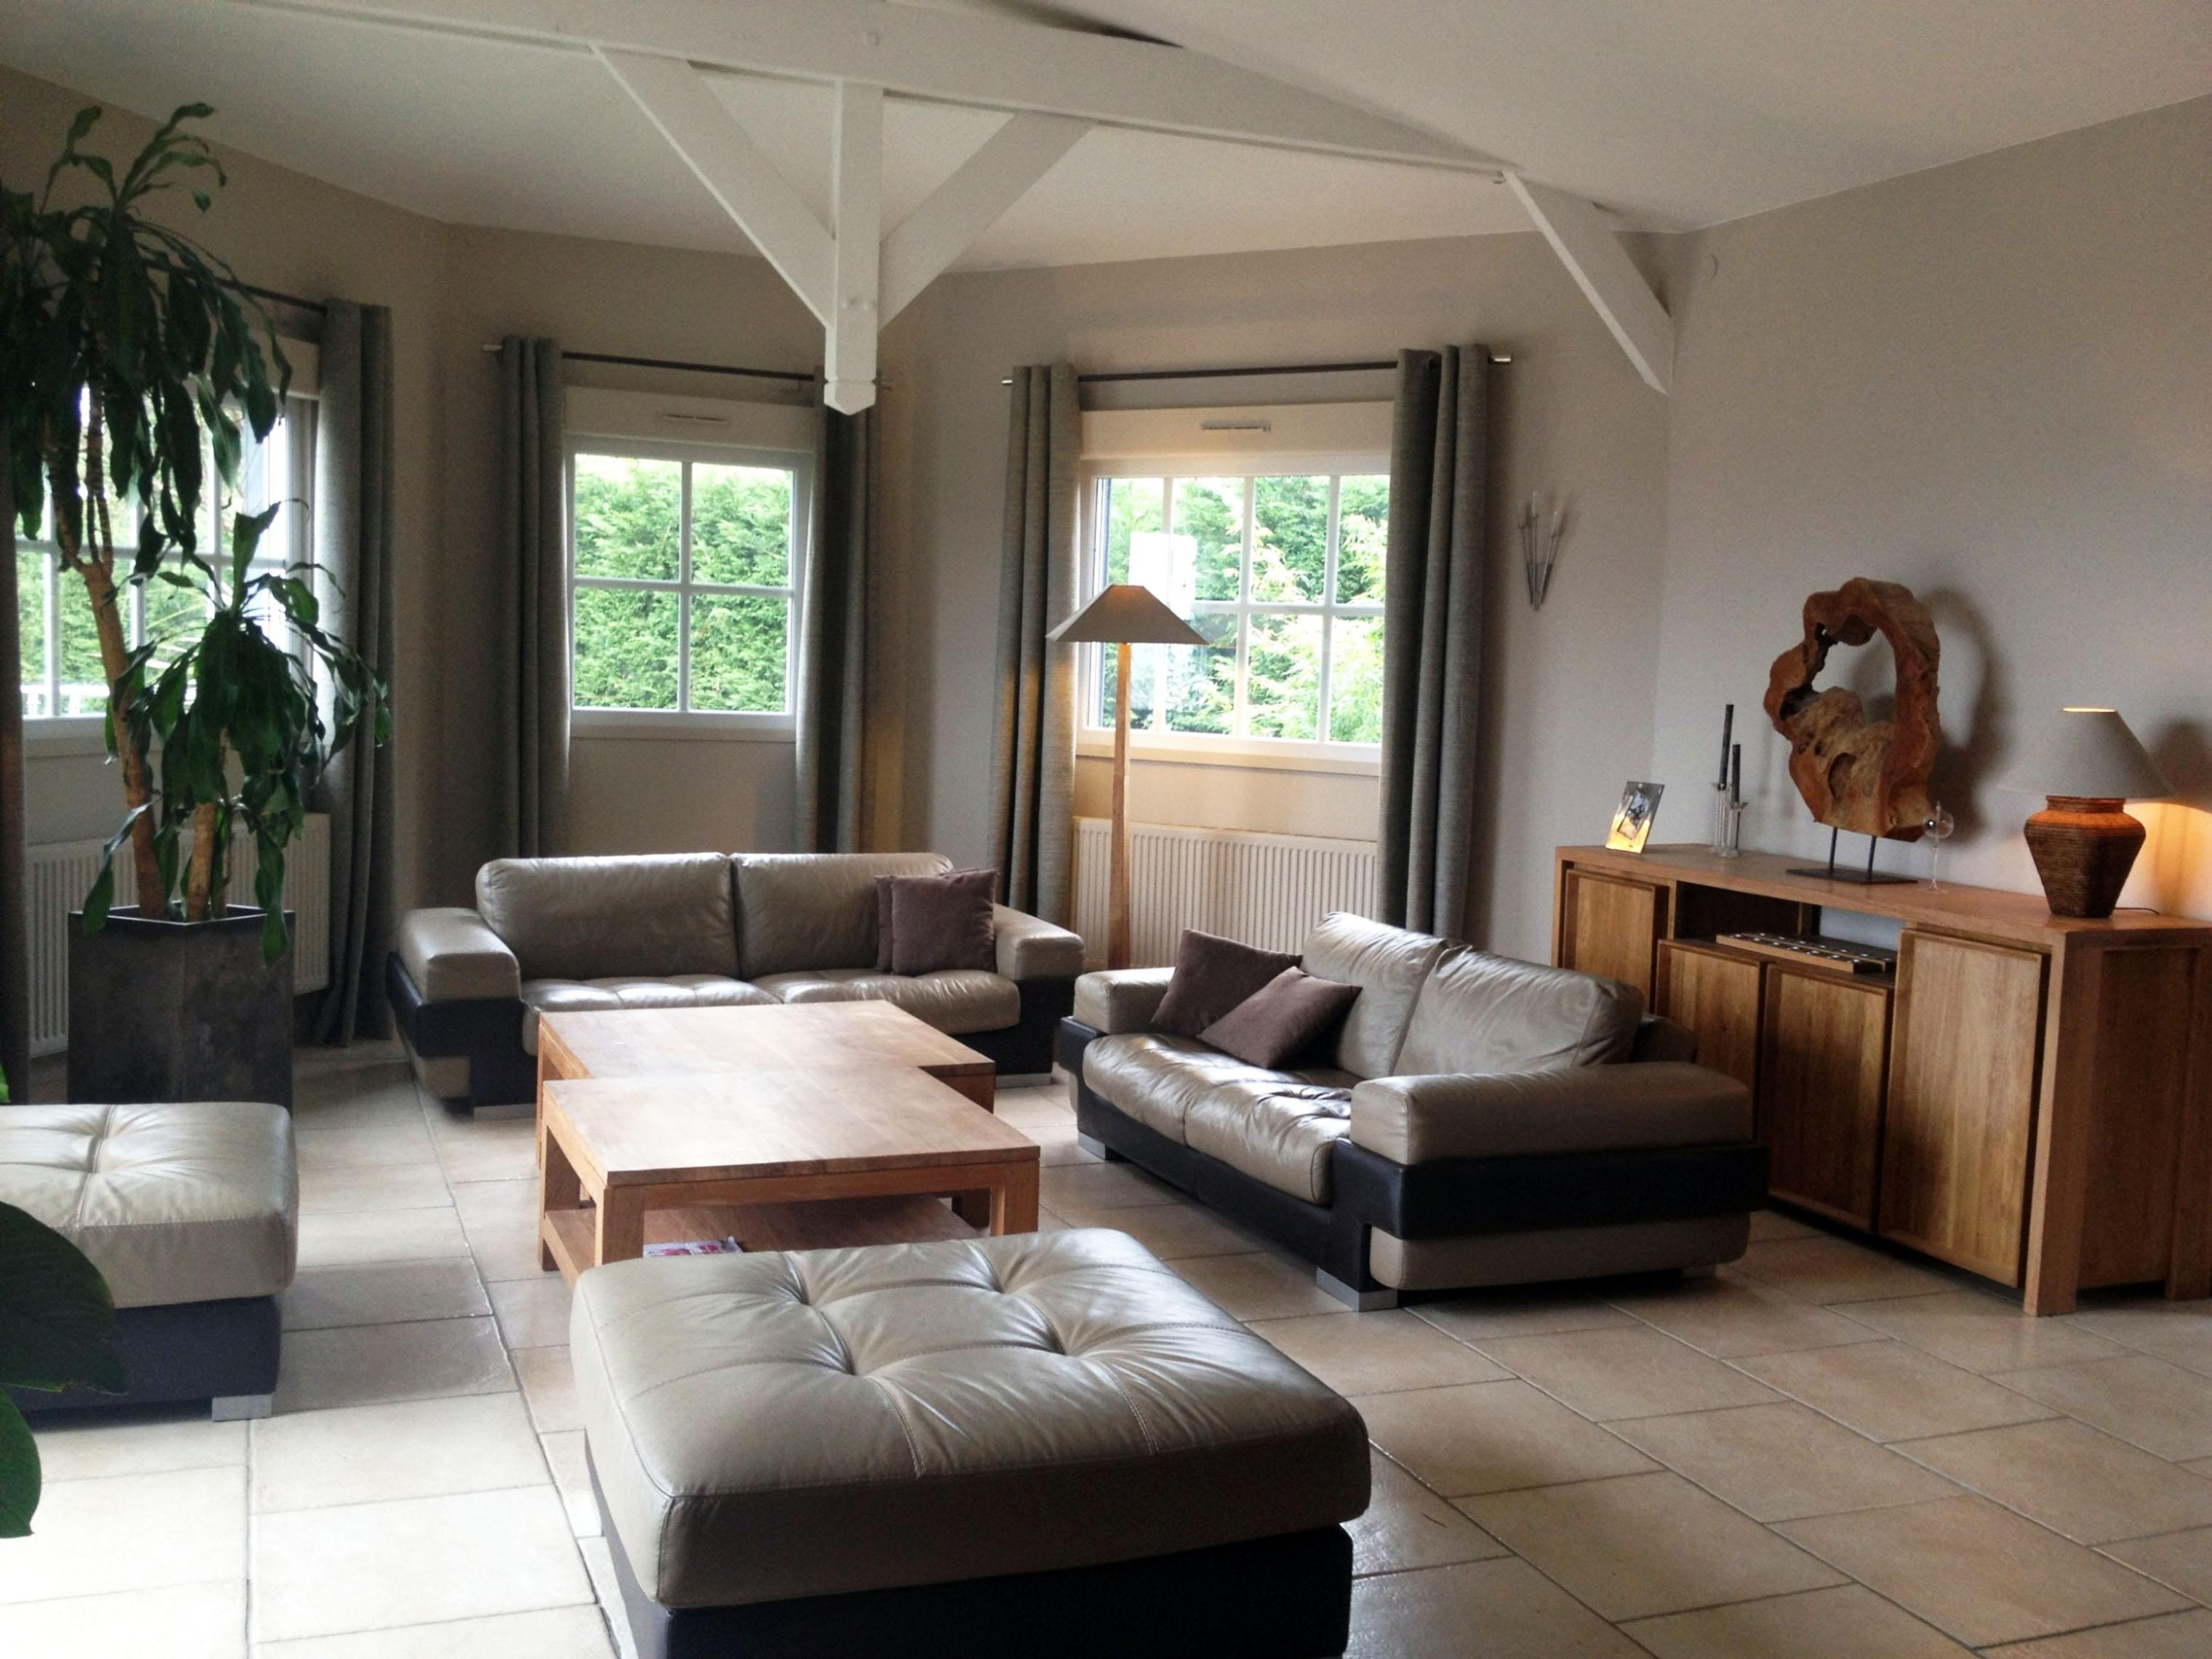 d coration maison deauville aude sweet home. Black Bedroom Furniture Sets. Home Design Ideas